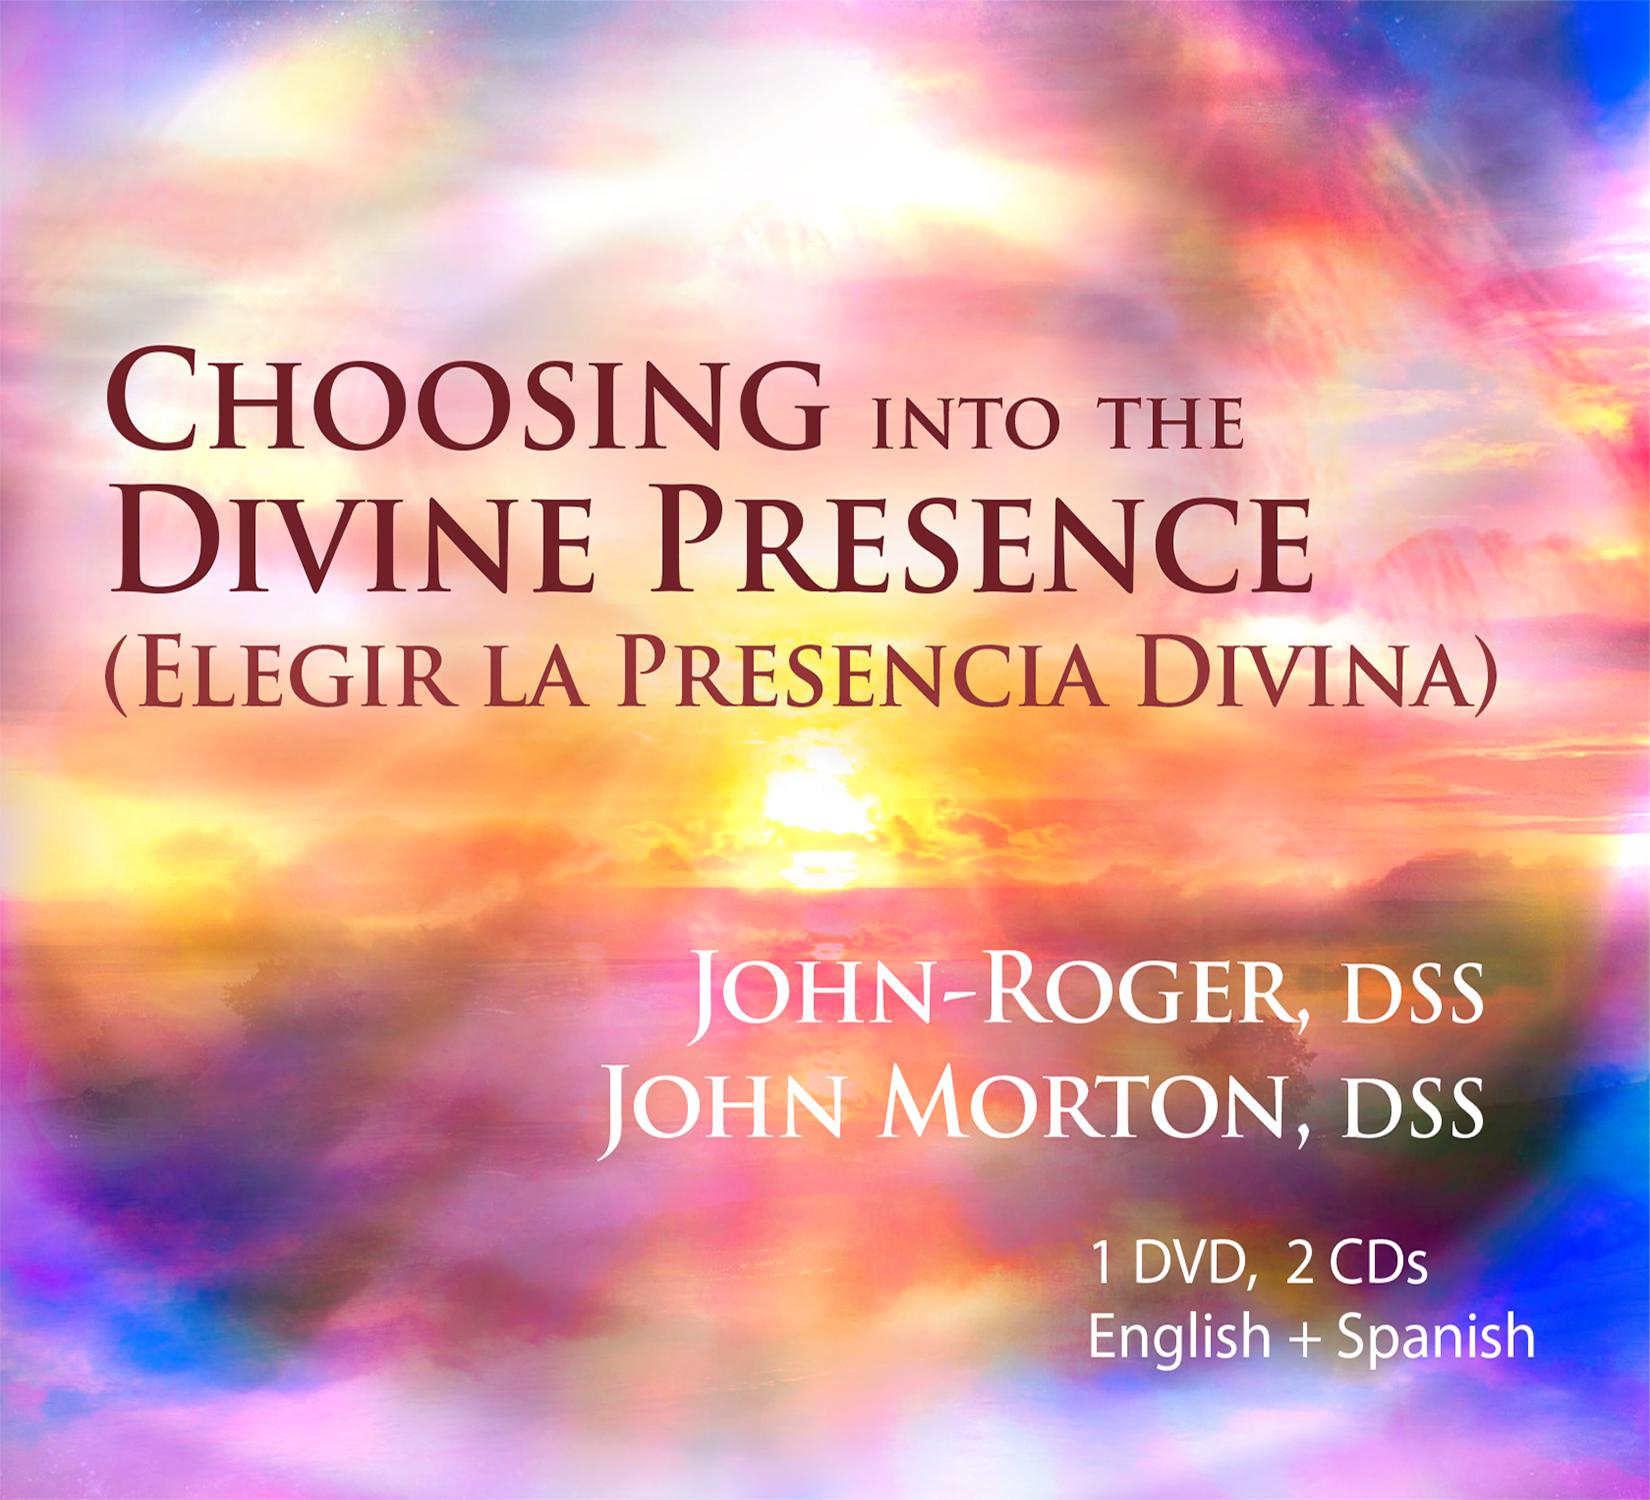 *NEW* Choosing Into the Divine Presence MP3/MP4